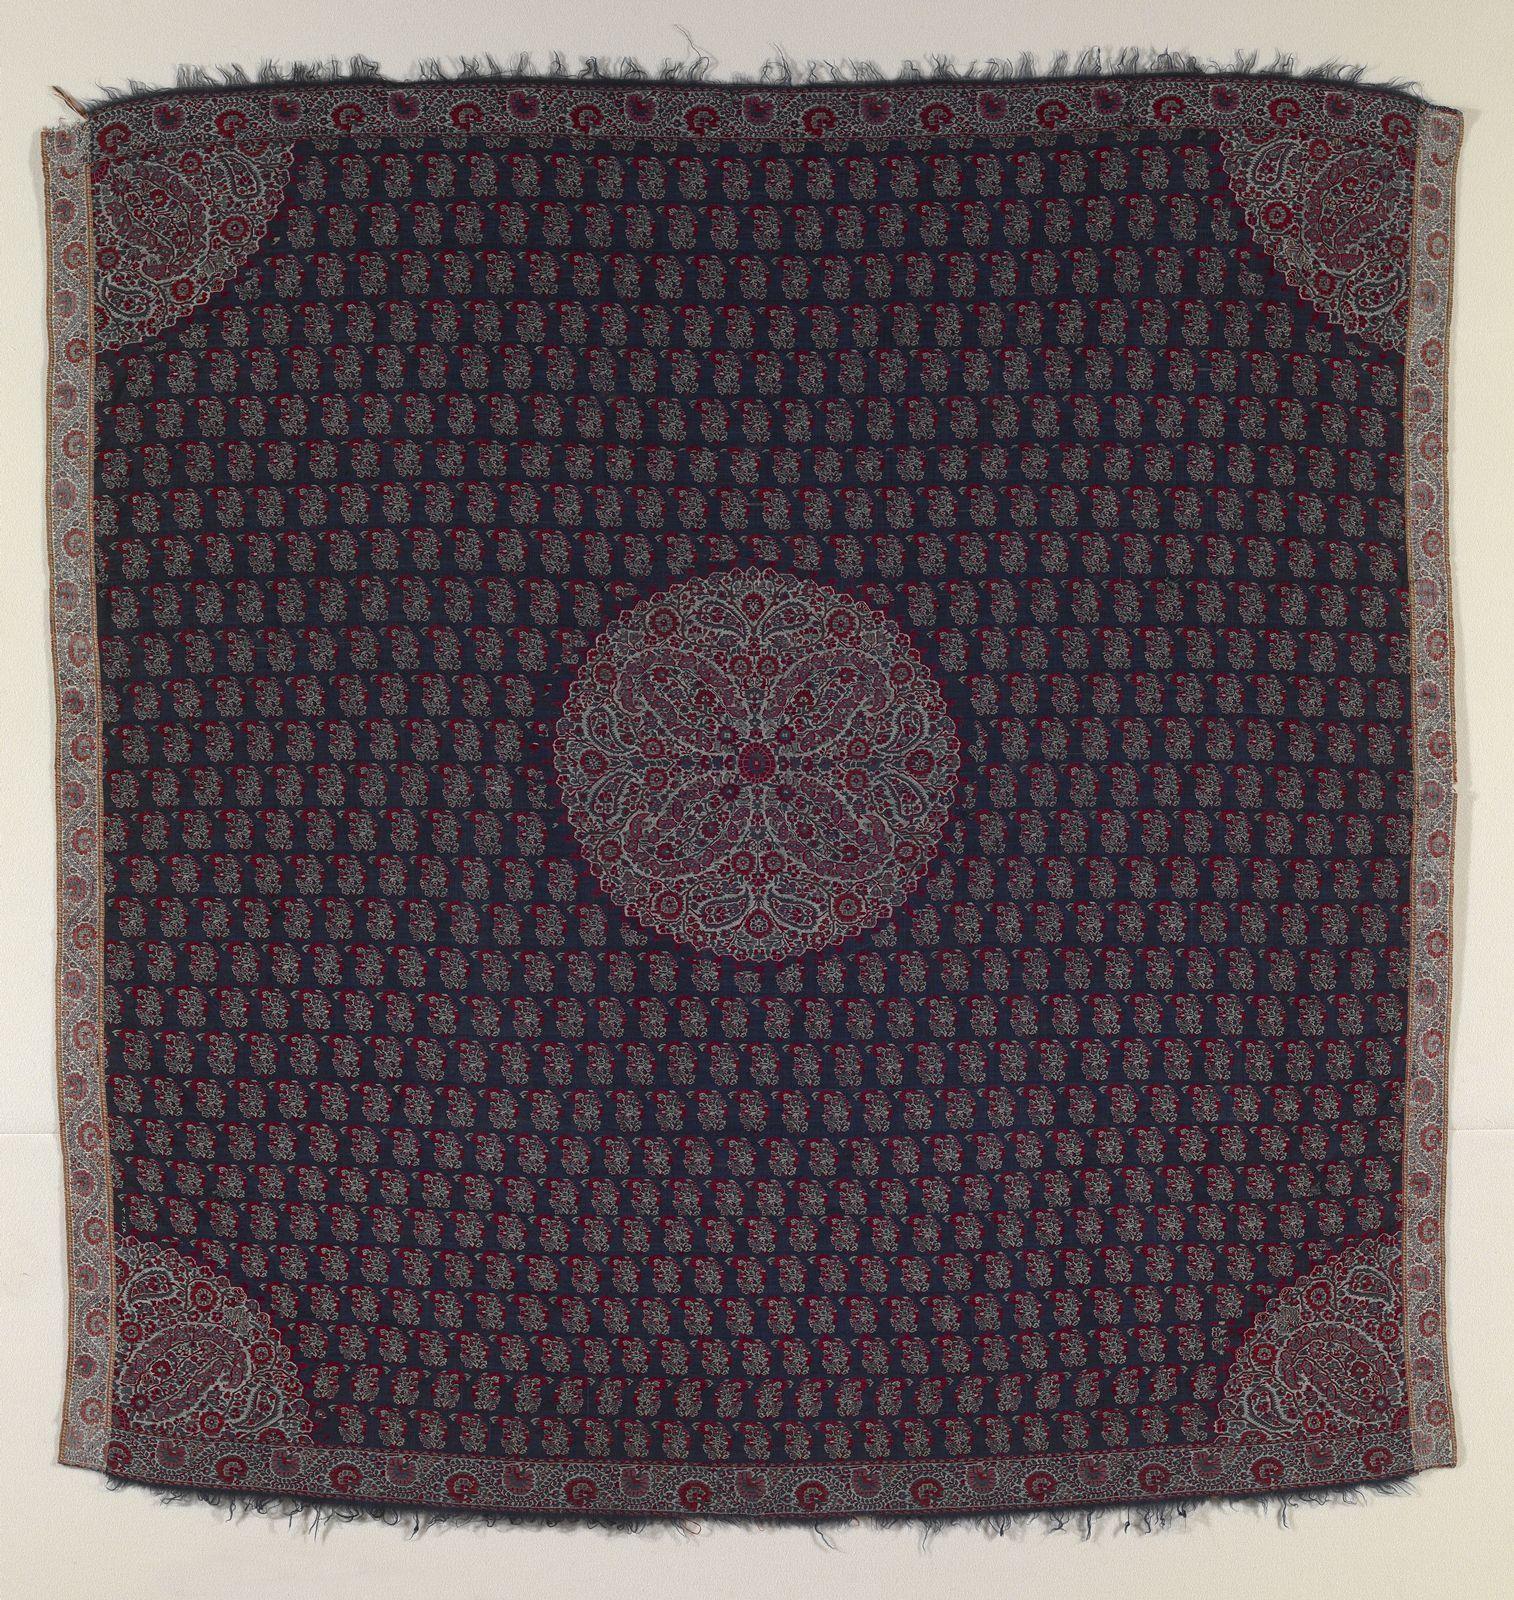 moon shawl circa 1815